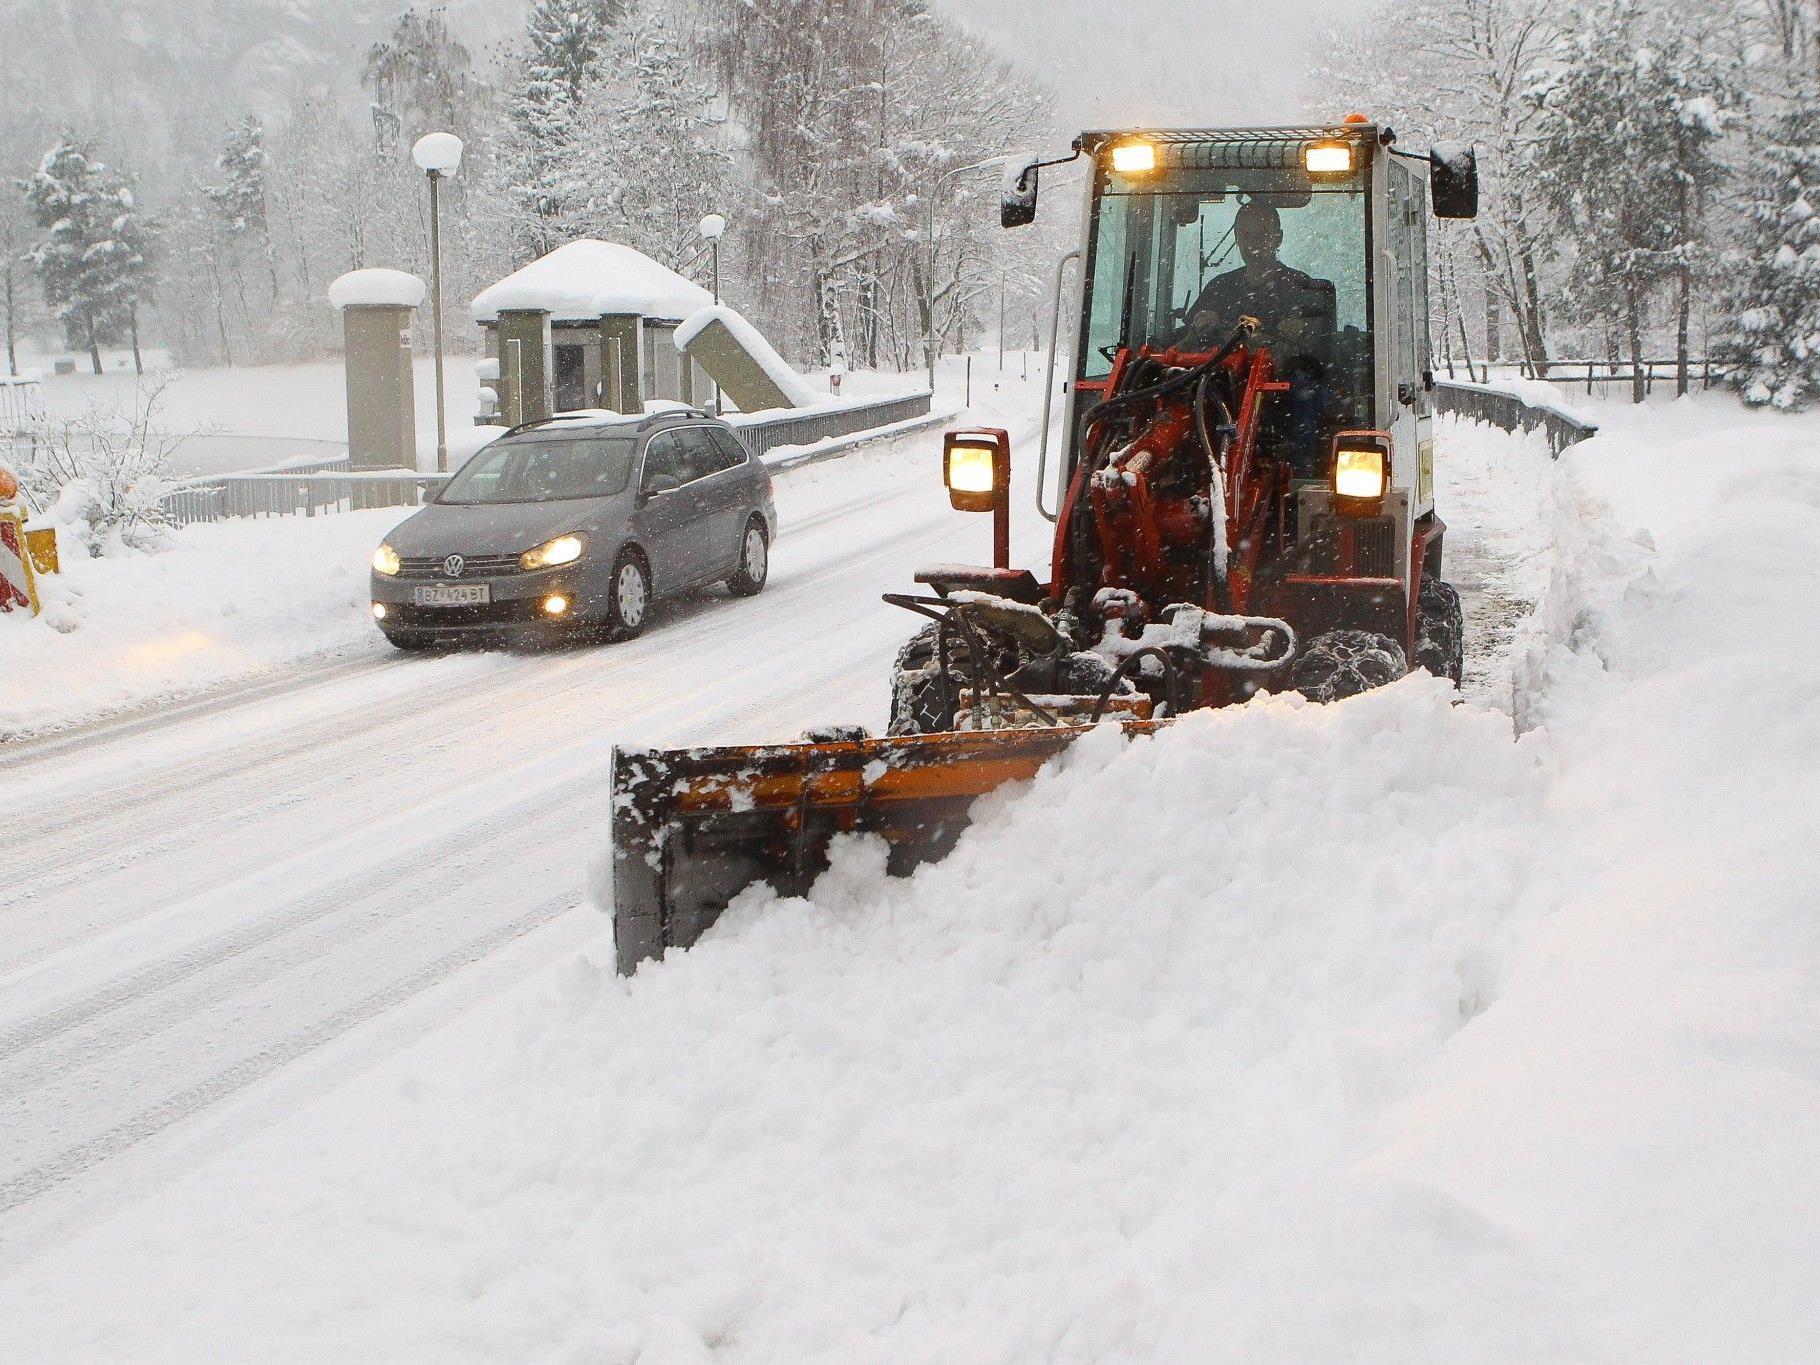 Ergiebige Neuschneemengen auch im Tal.